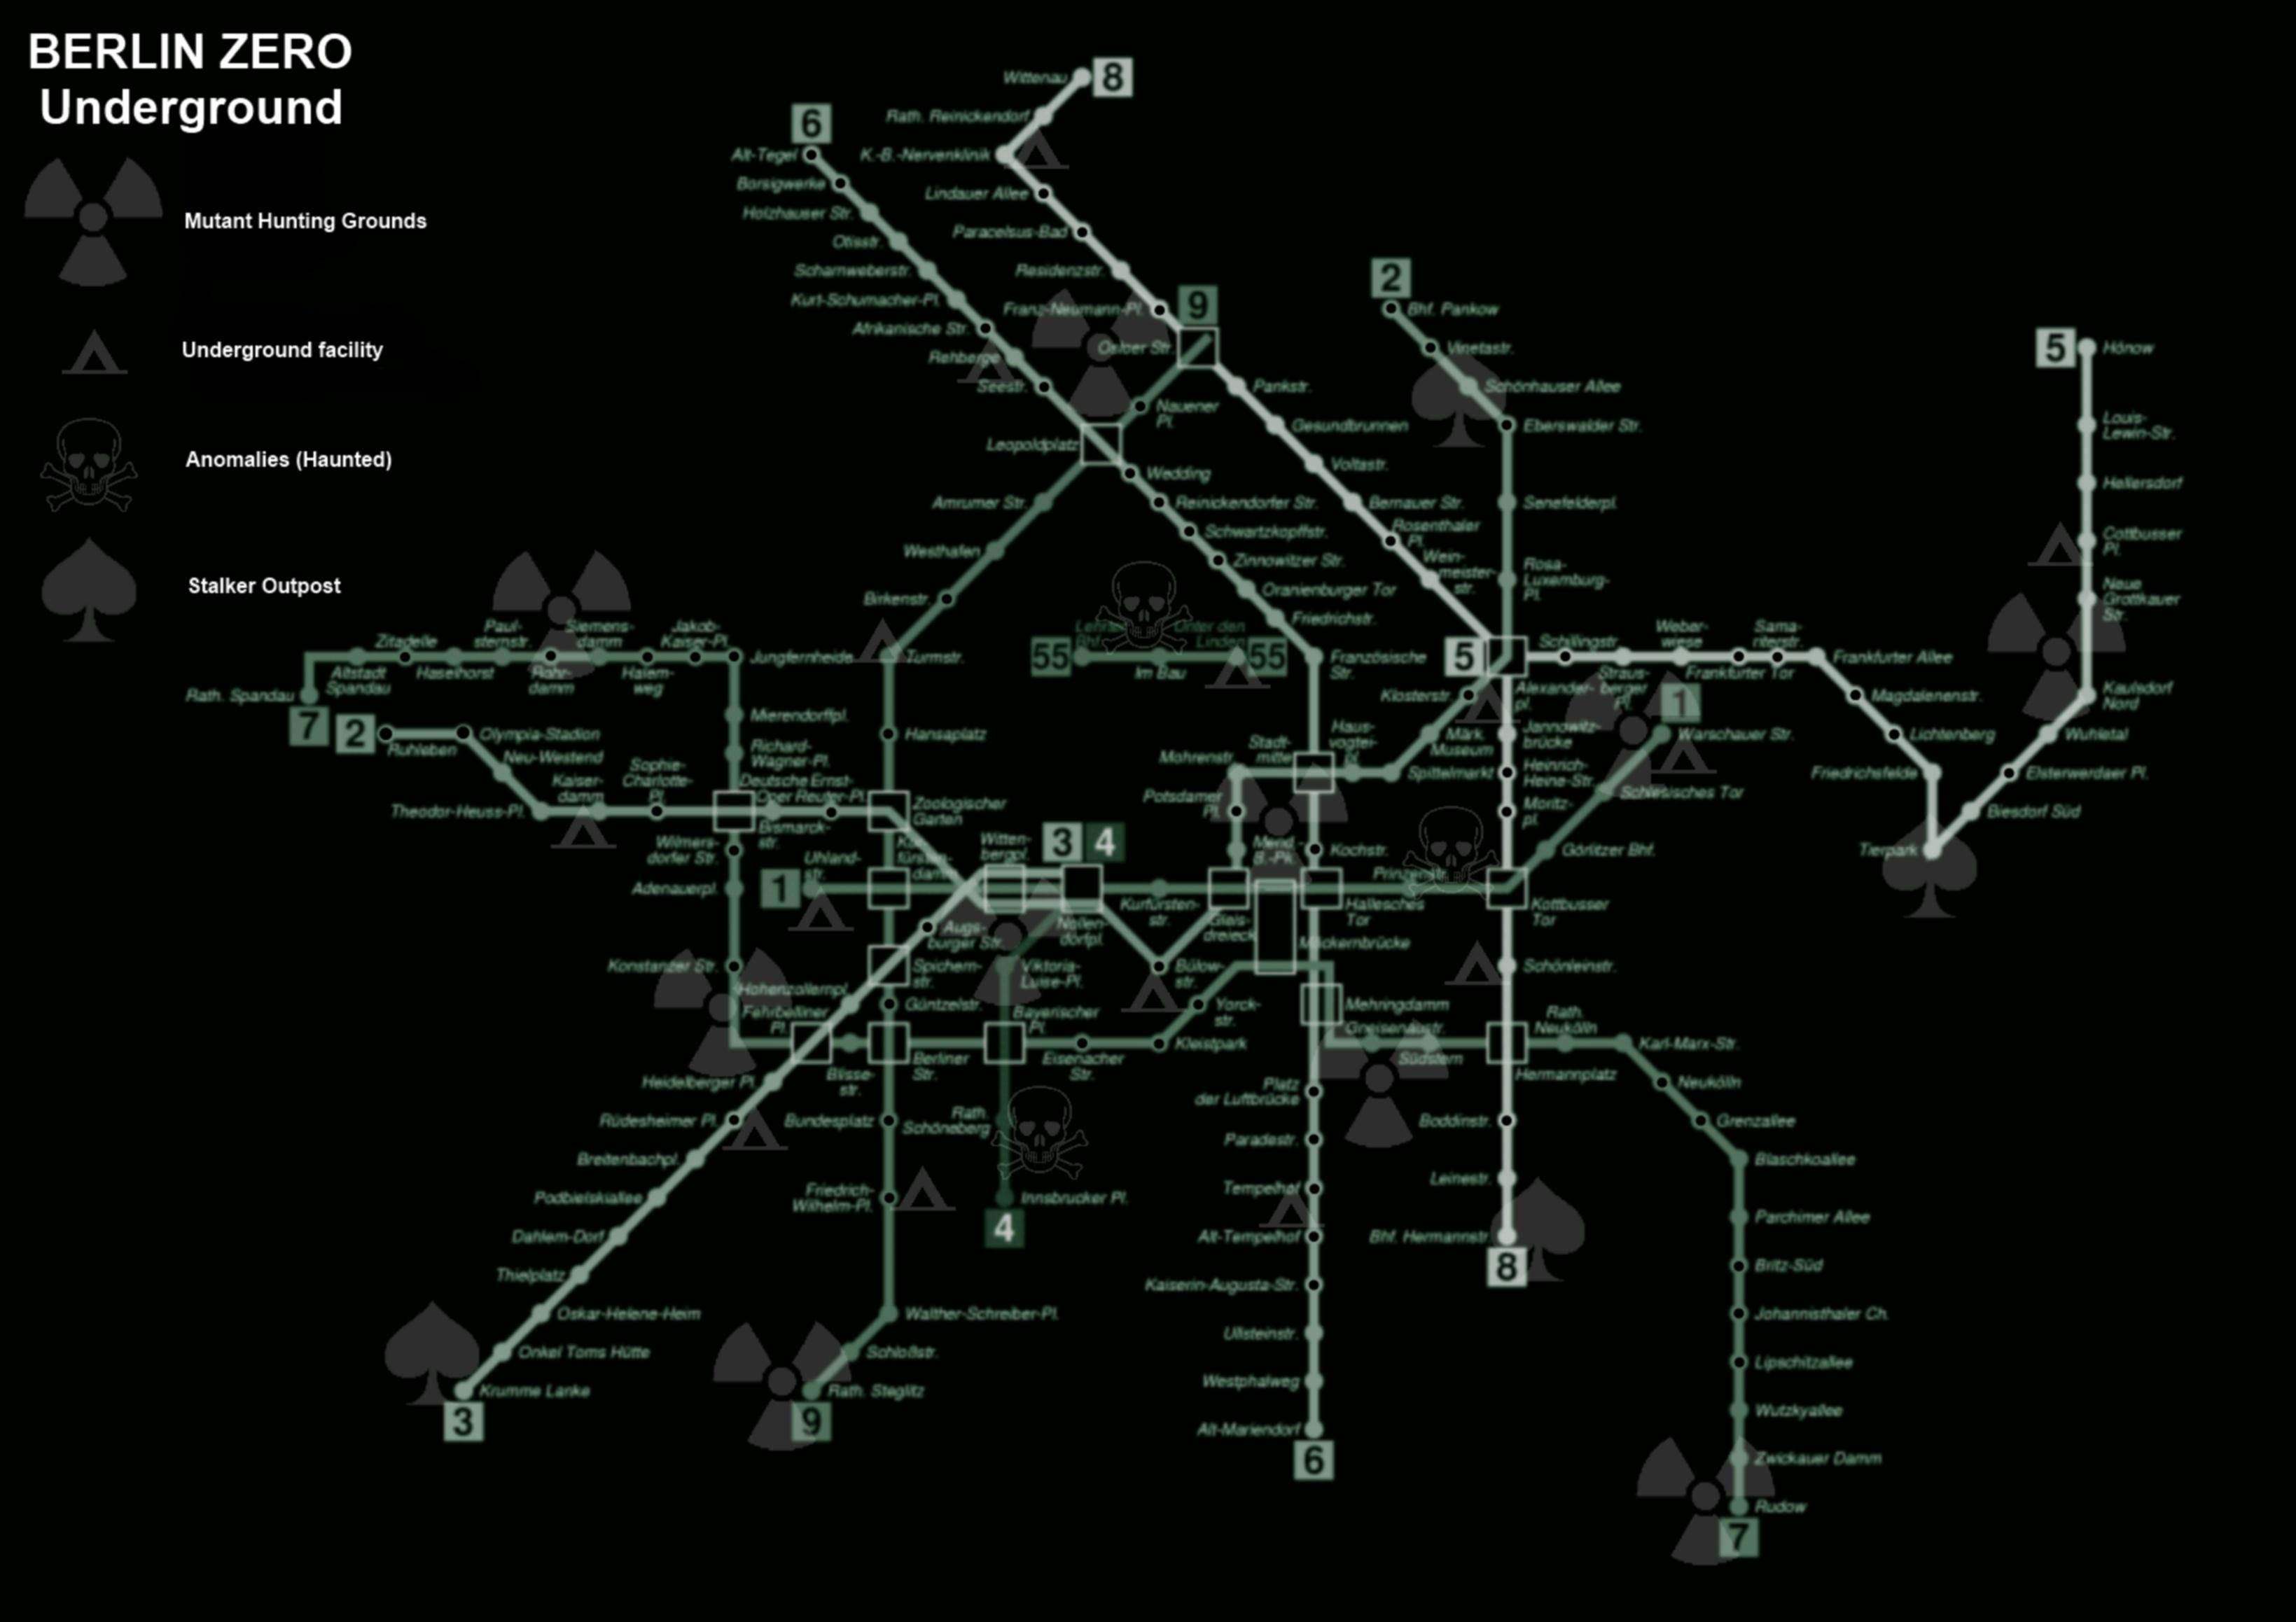 Berlin Subway Map Poster.Summer2010